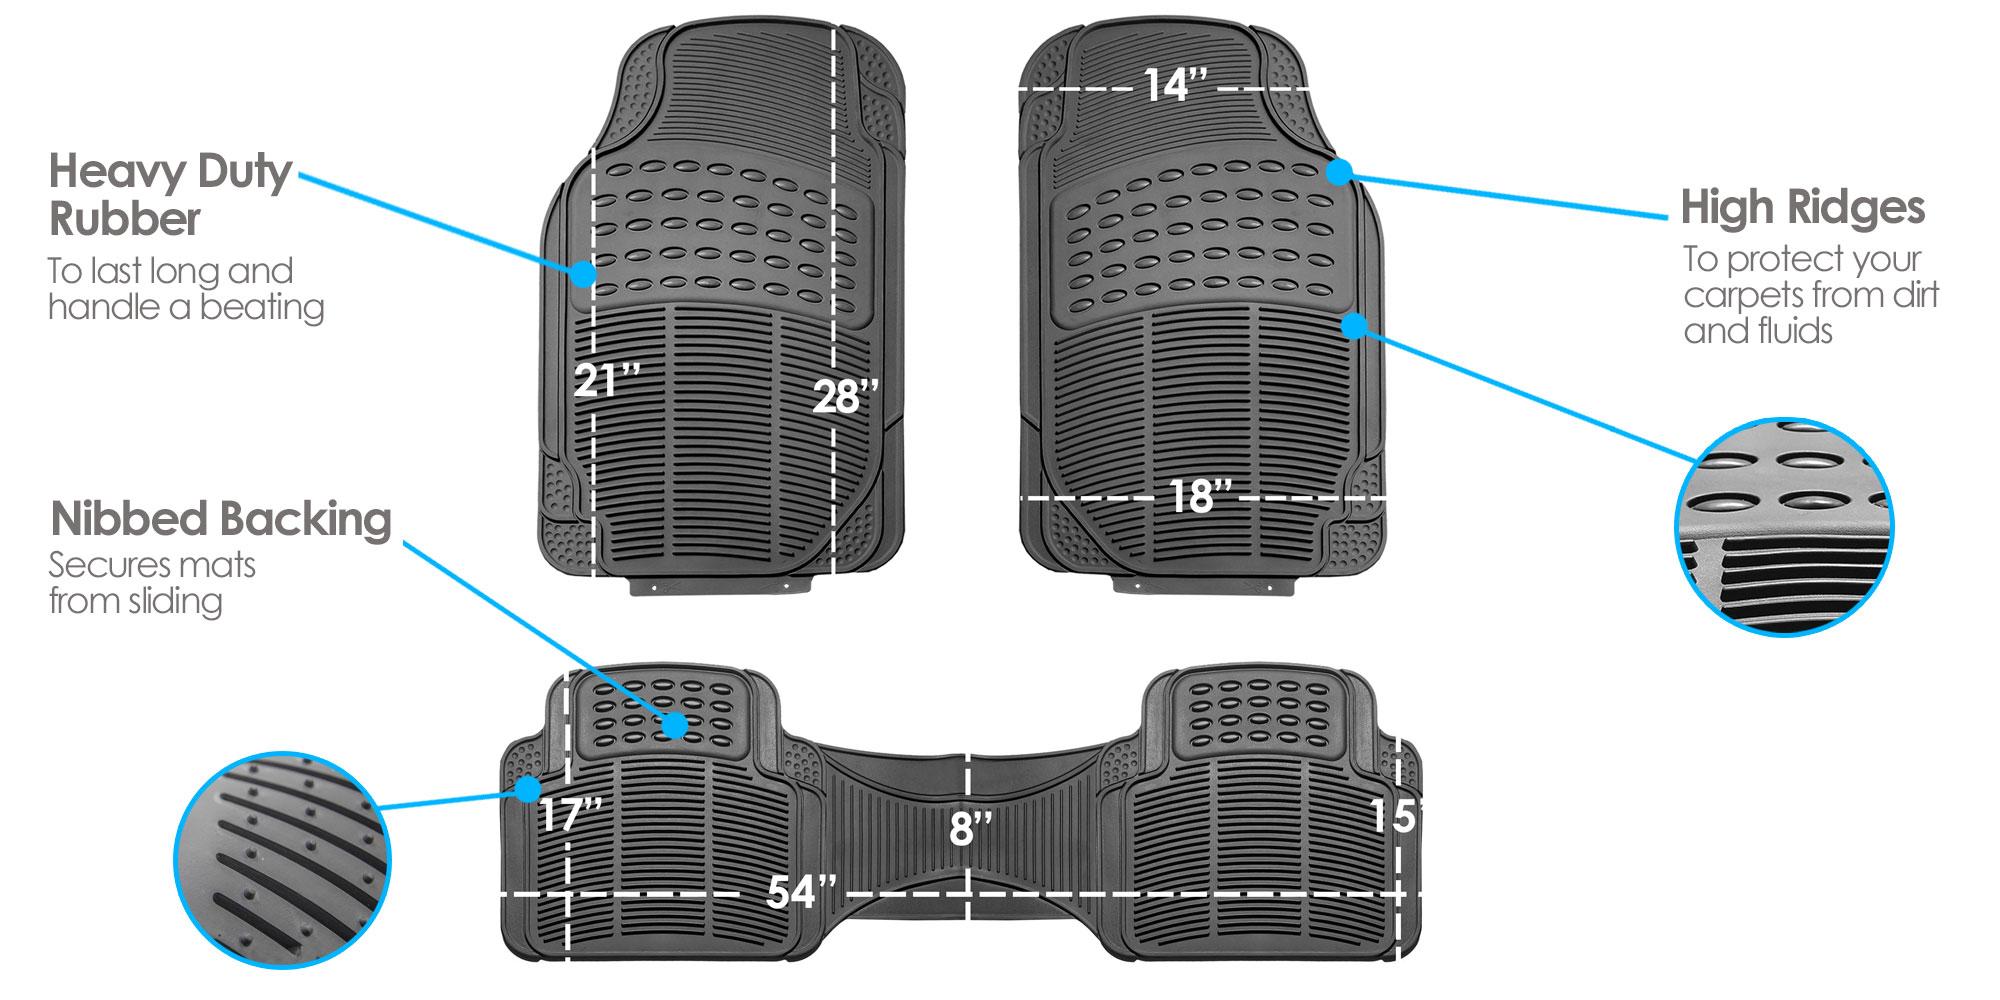 3pc-Floor-Mats-for-Auto-Car-SUV-Van-Heavy-Duty-3-Colors-w-Free-Gift thumbnail 23